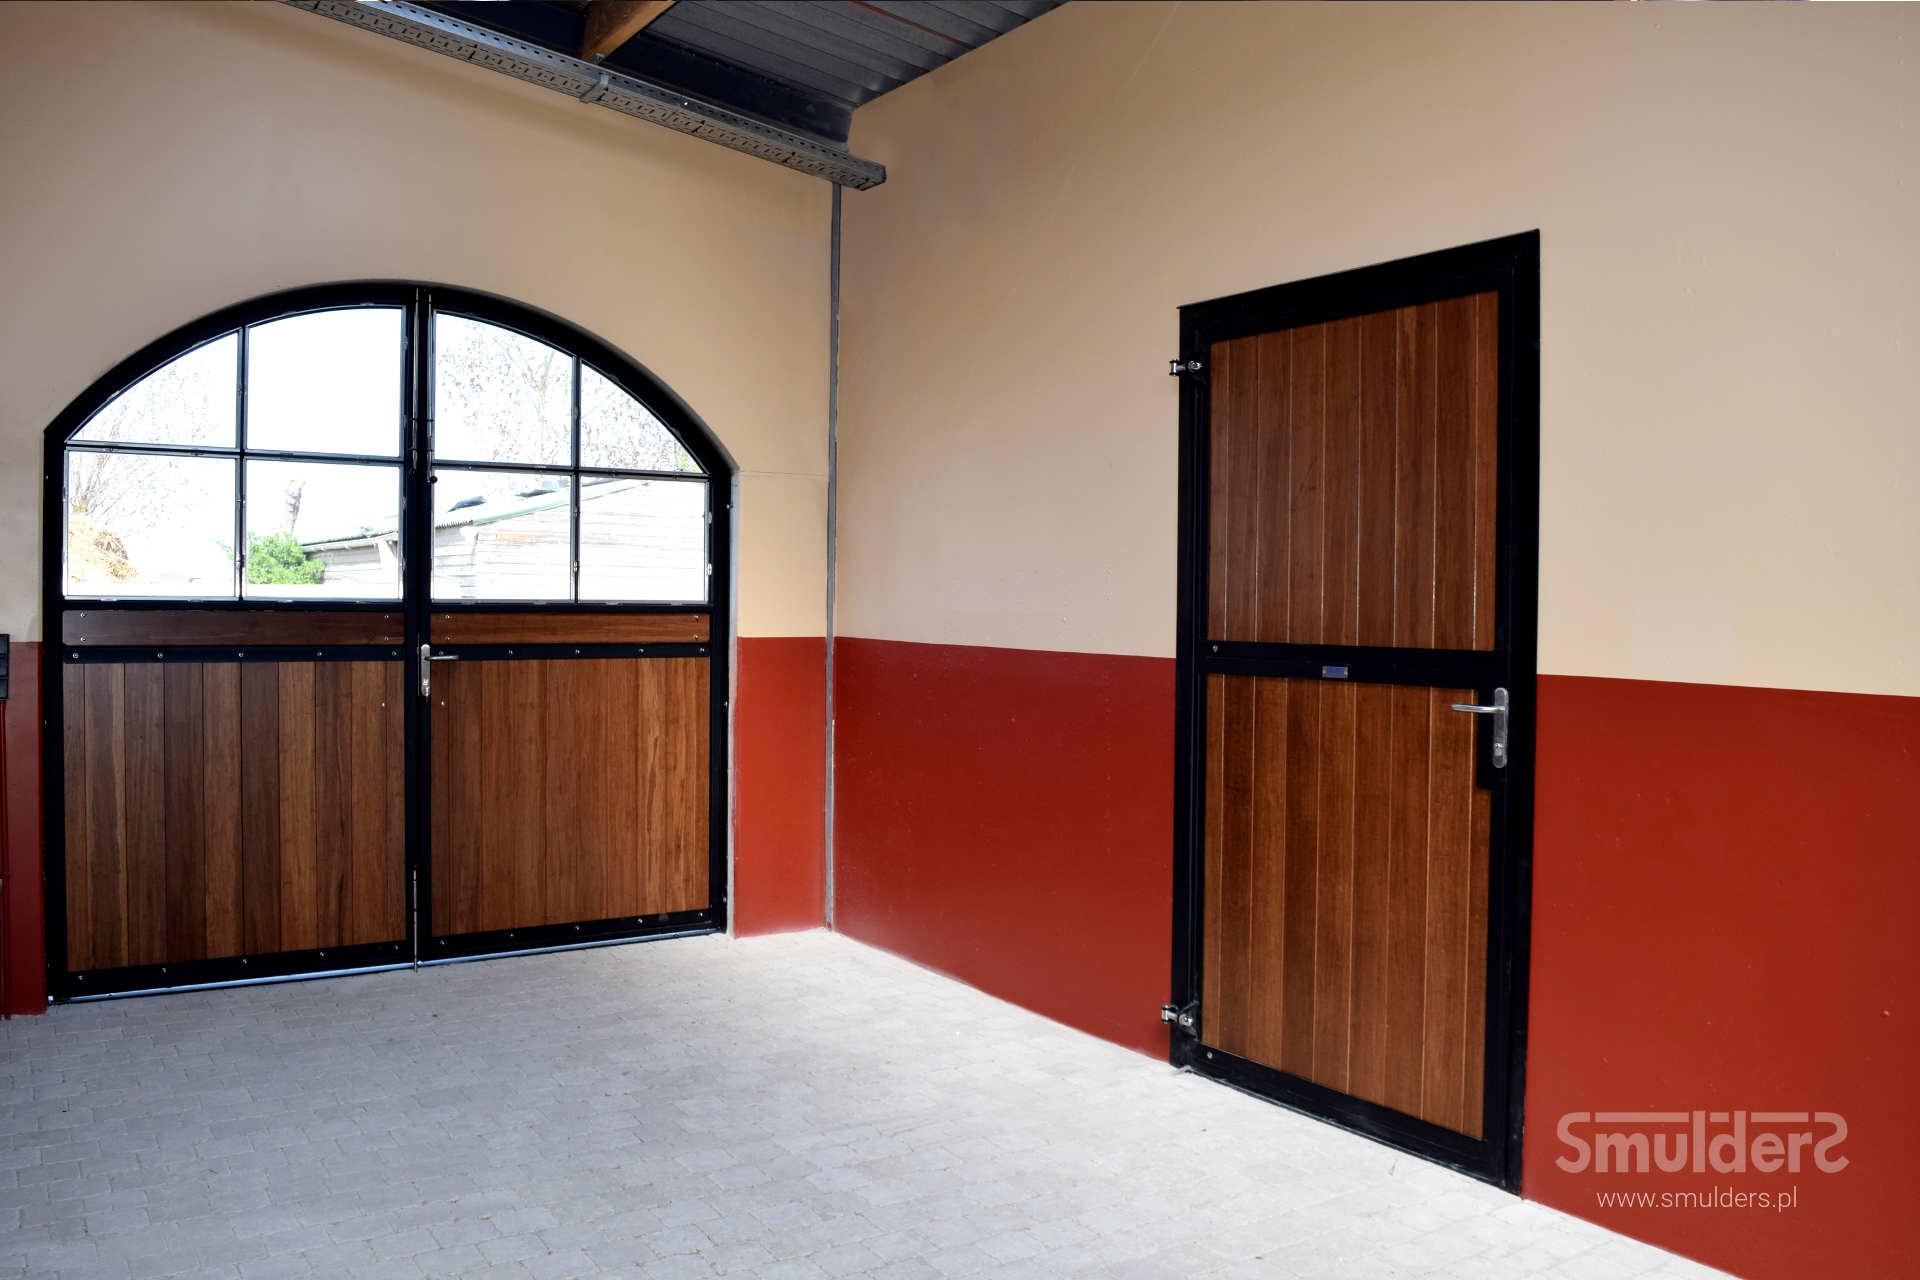 https://www.smulders.pl/wp-content/uploads/2019/03/f005_internal-stables_windsor_doors_windows_barn-doors_PRSH_SMULDERS_PL.jpg